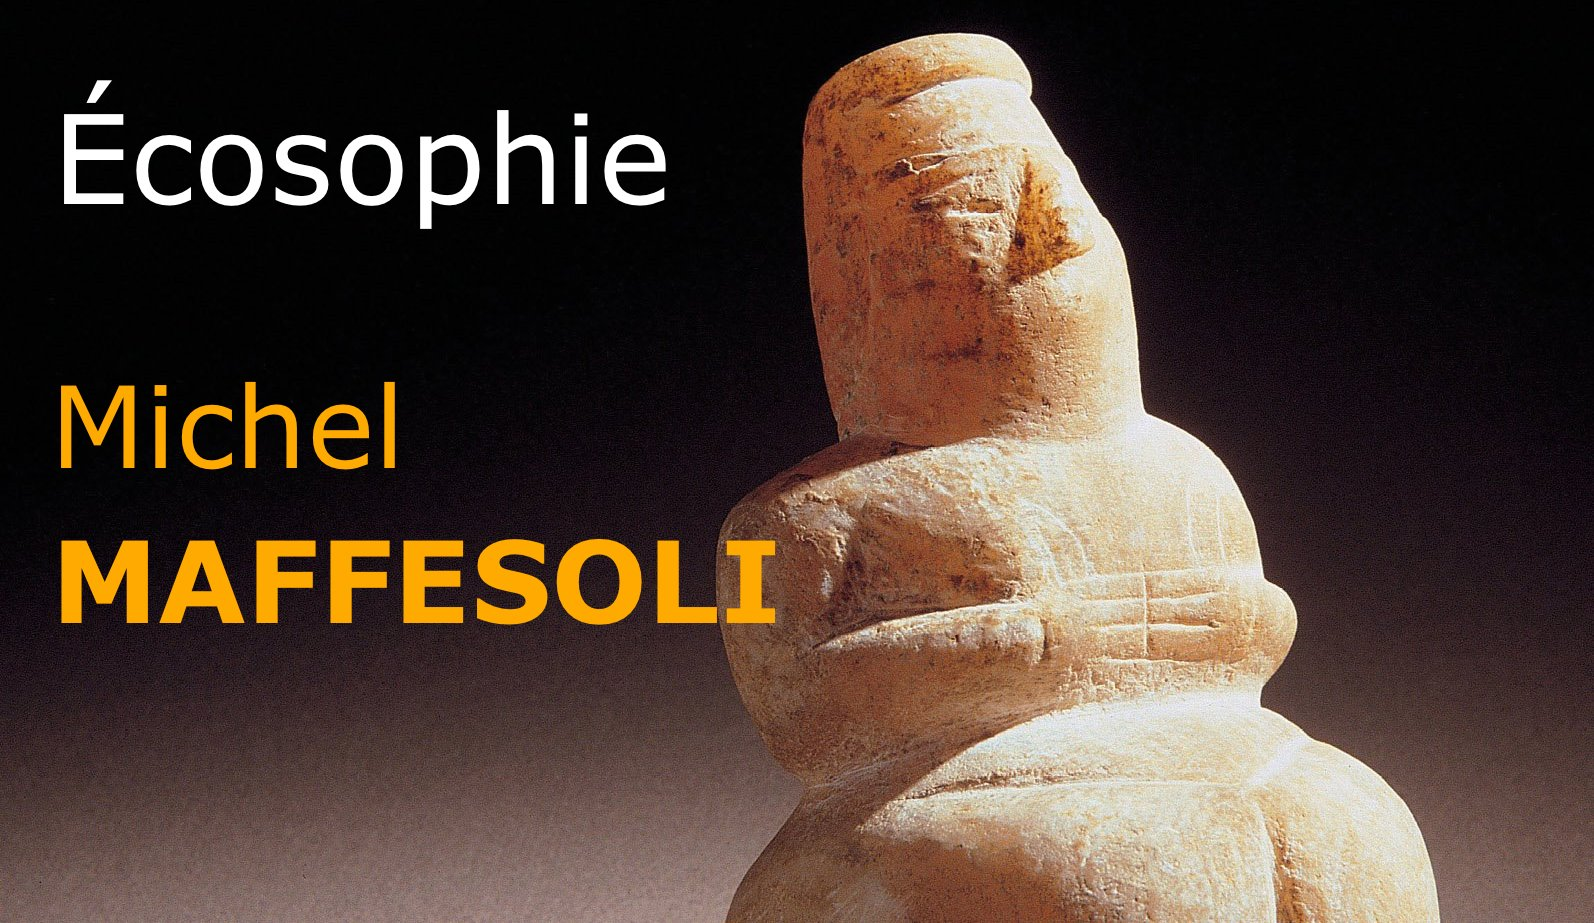 Écosophie, Michel Maffesoli